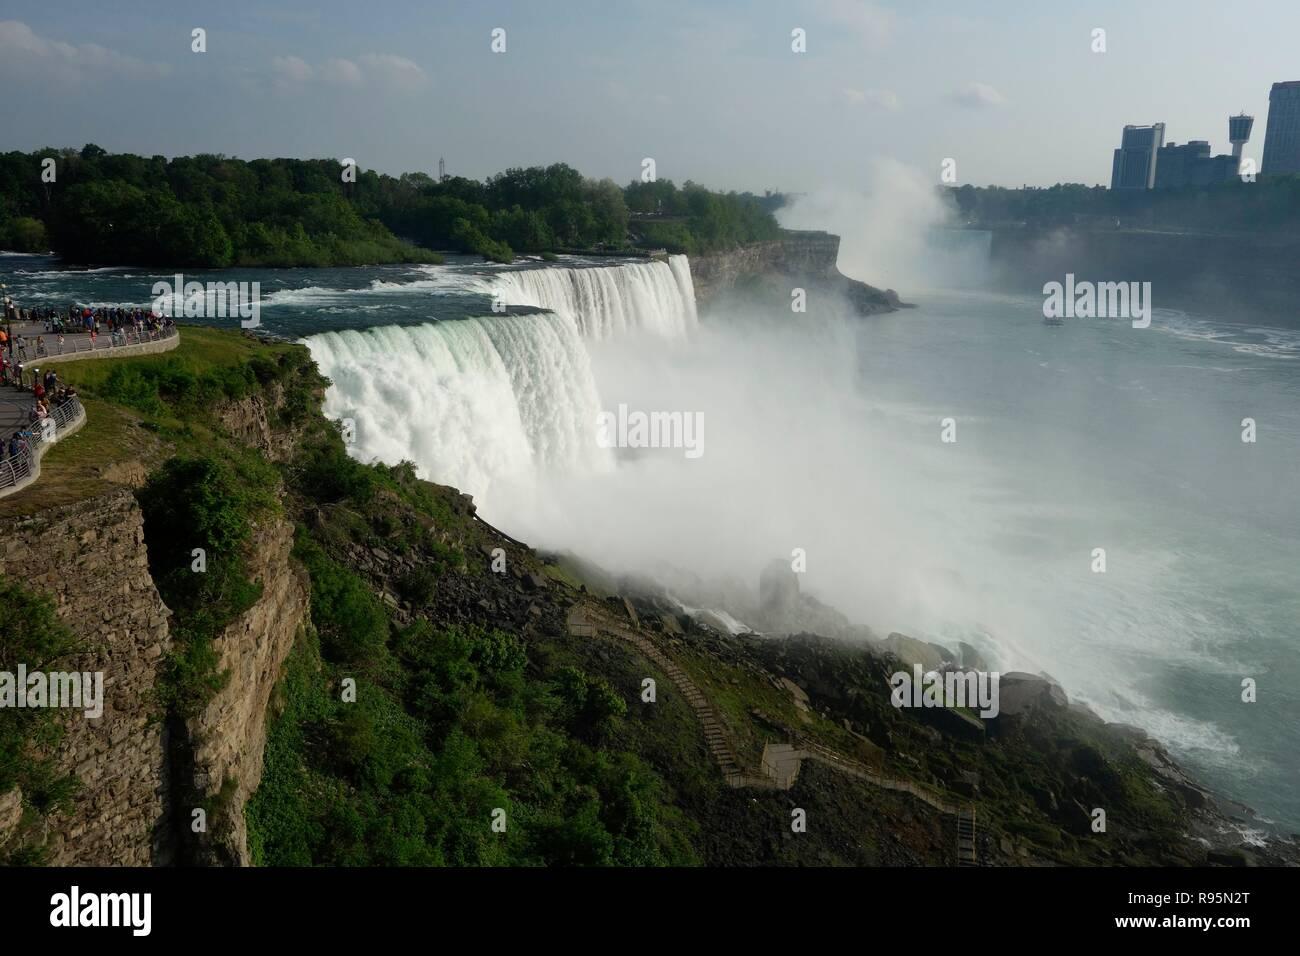 Niagara Falls And Tourists From The American Side Niagara